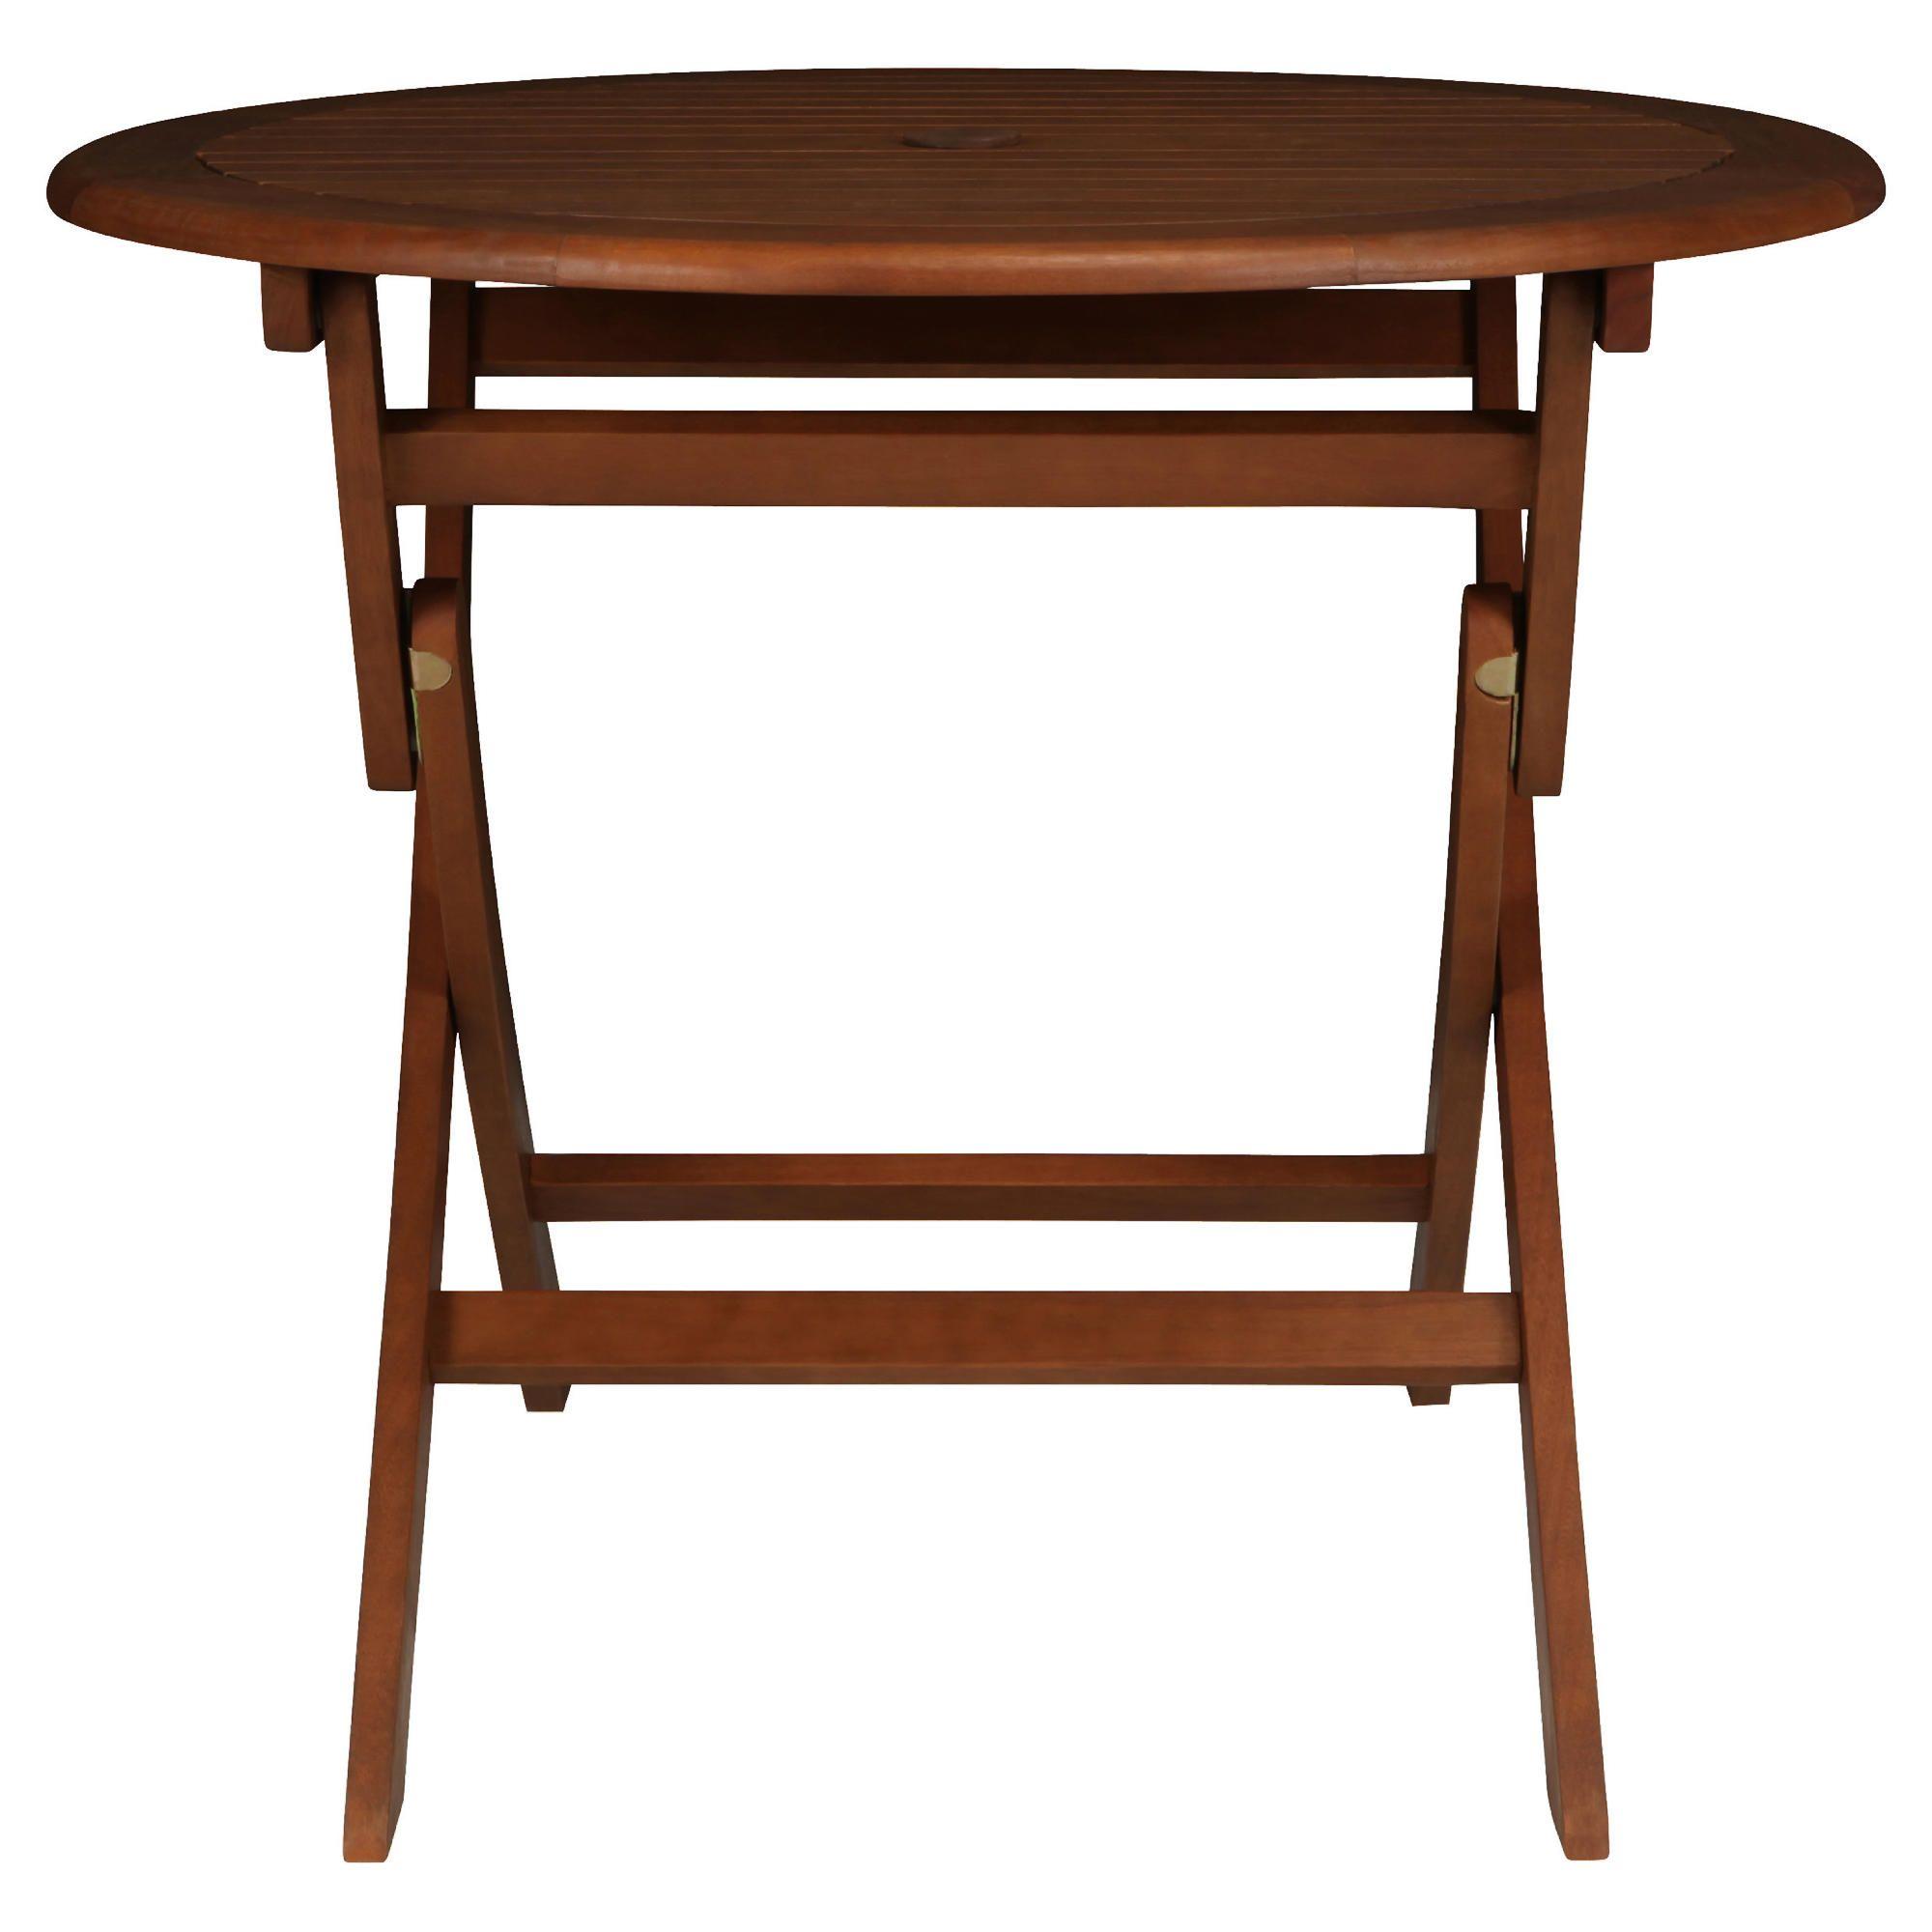 Home And Garden Garden And Leisure Garden Furniture Windsor Wooden Folding Dining Arm Chair